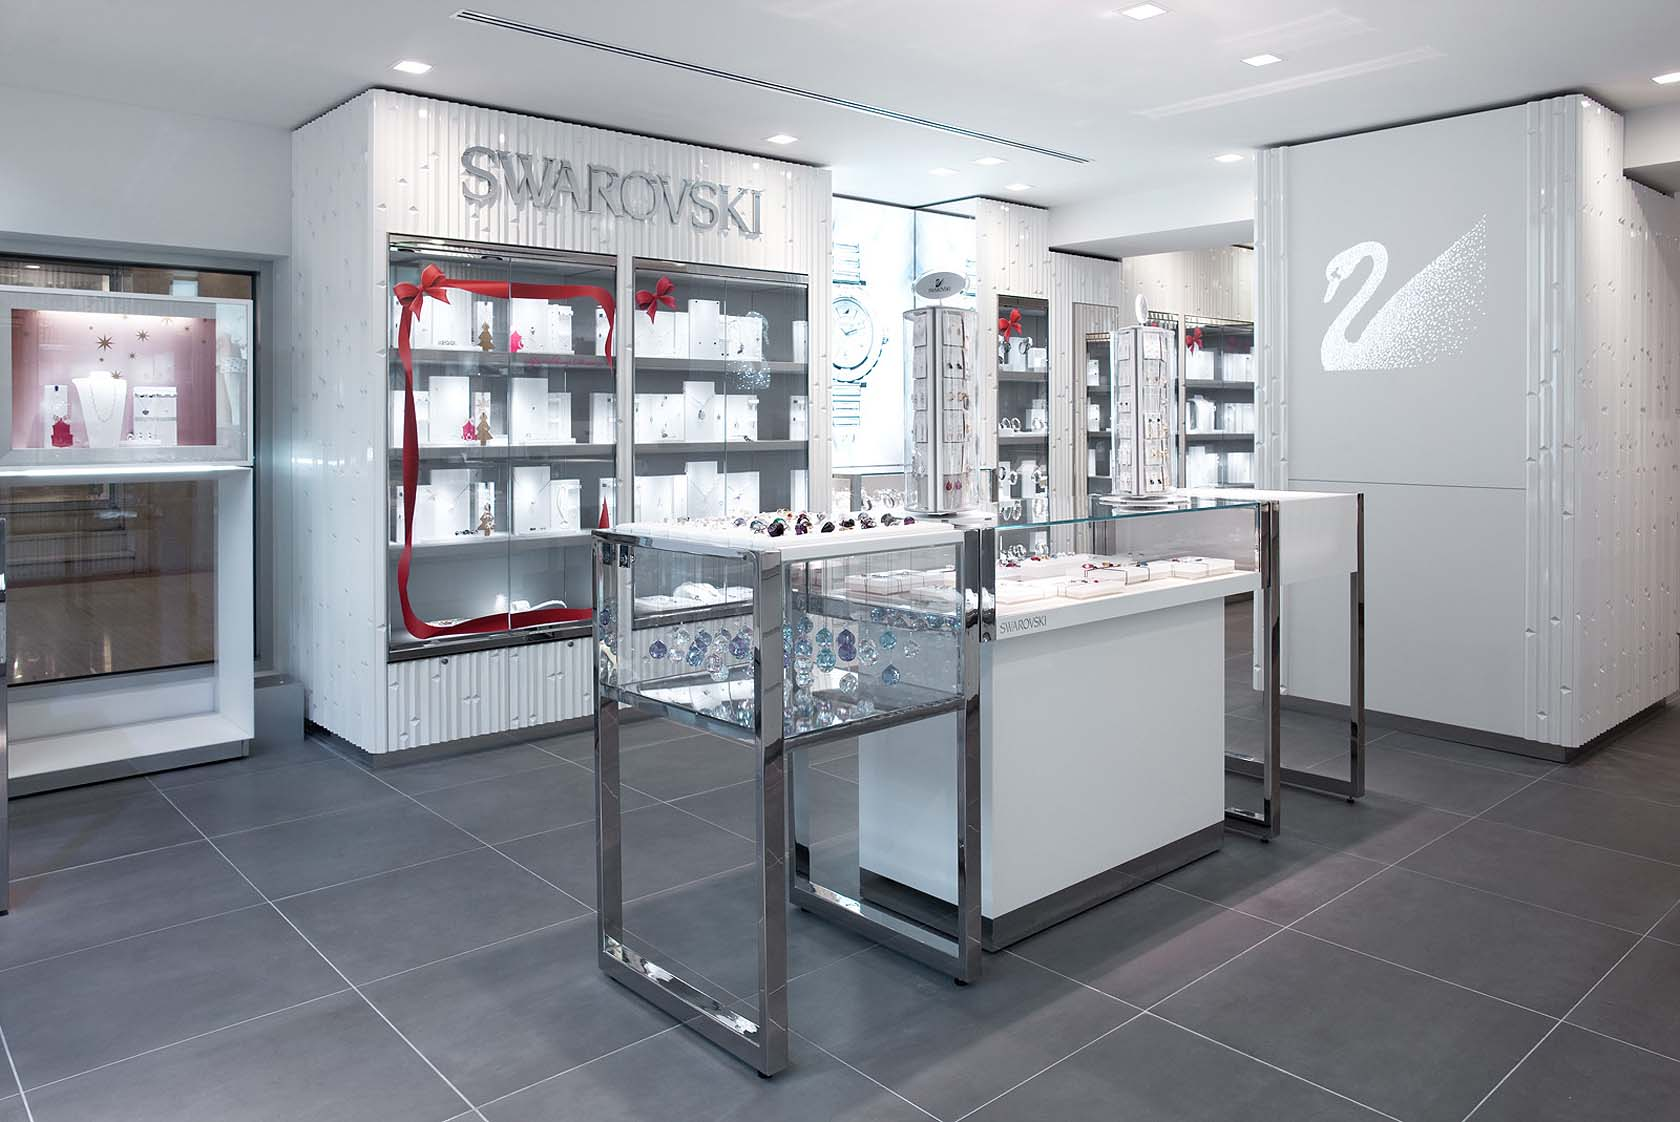 SWAROVSKI jewelry store at Champs-Elysées, Paris - SAM l MAU ...